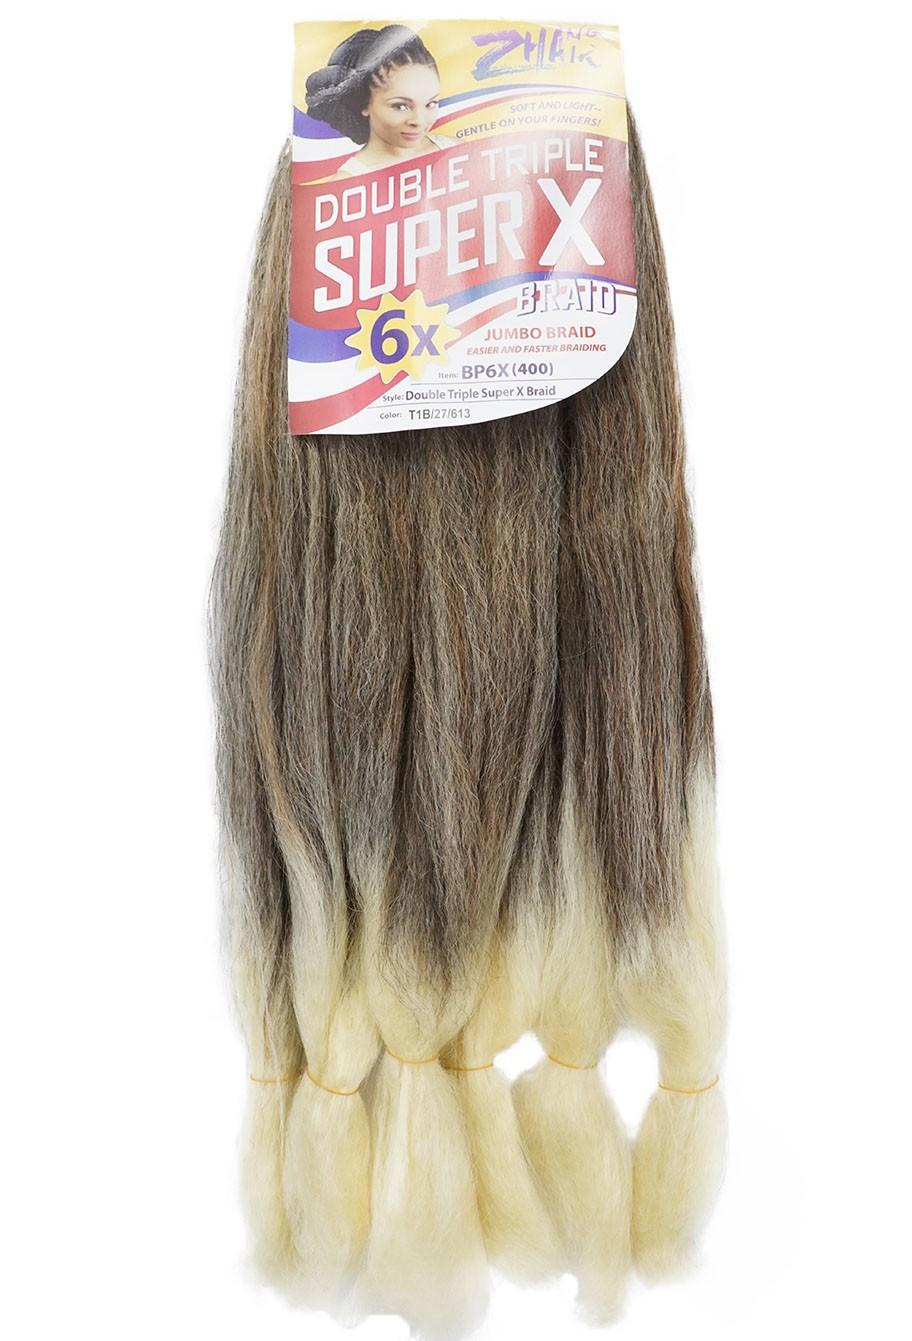 Cabelo Sintético - Zhang hair jumbo - Super X (400g) - Cor: Preto com mel e Loiro (T1B/27/613)